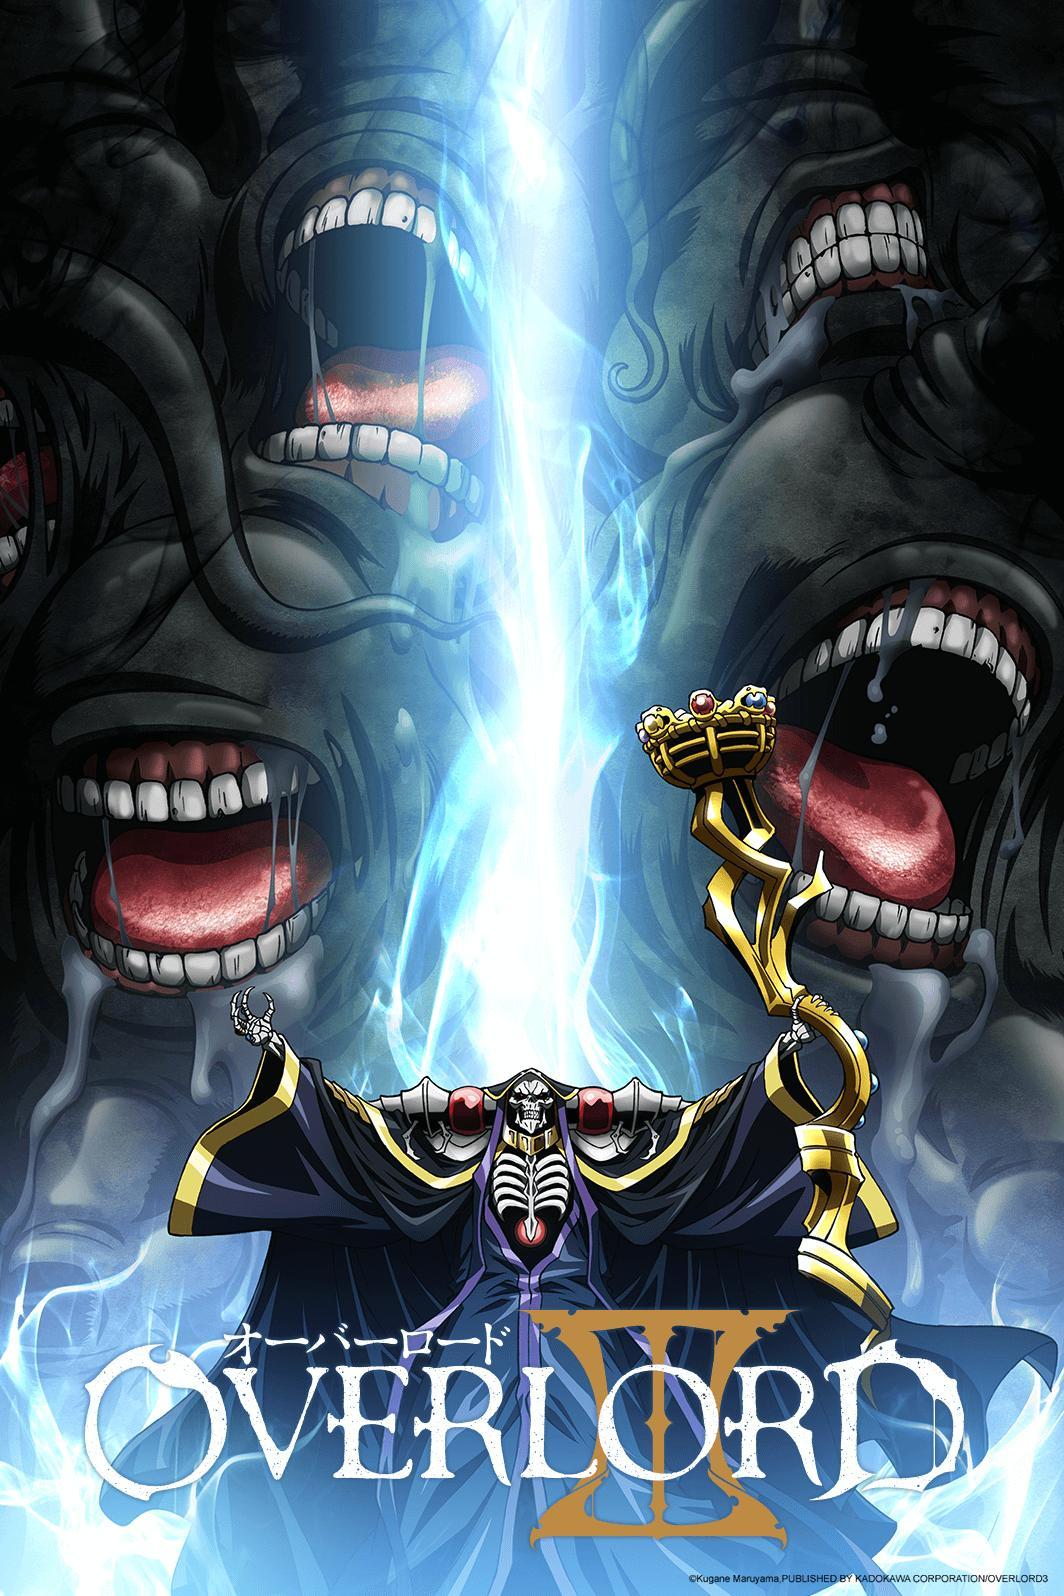 Overlord - Watch on Crunchyroll